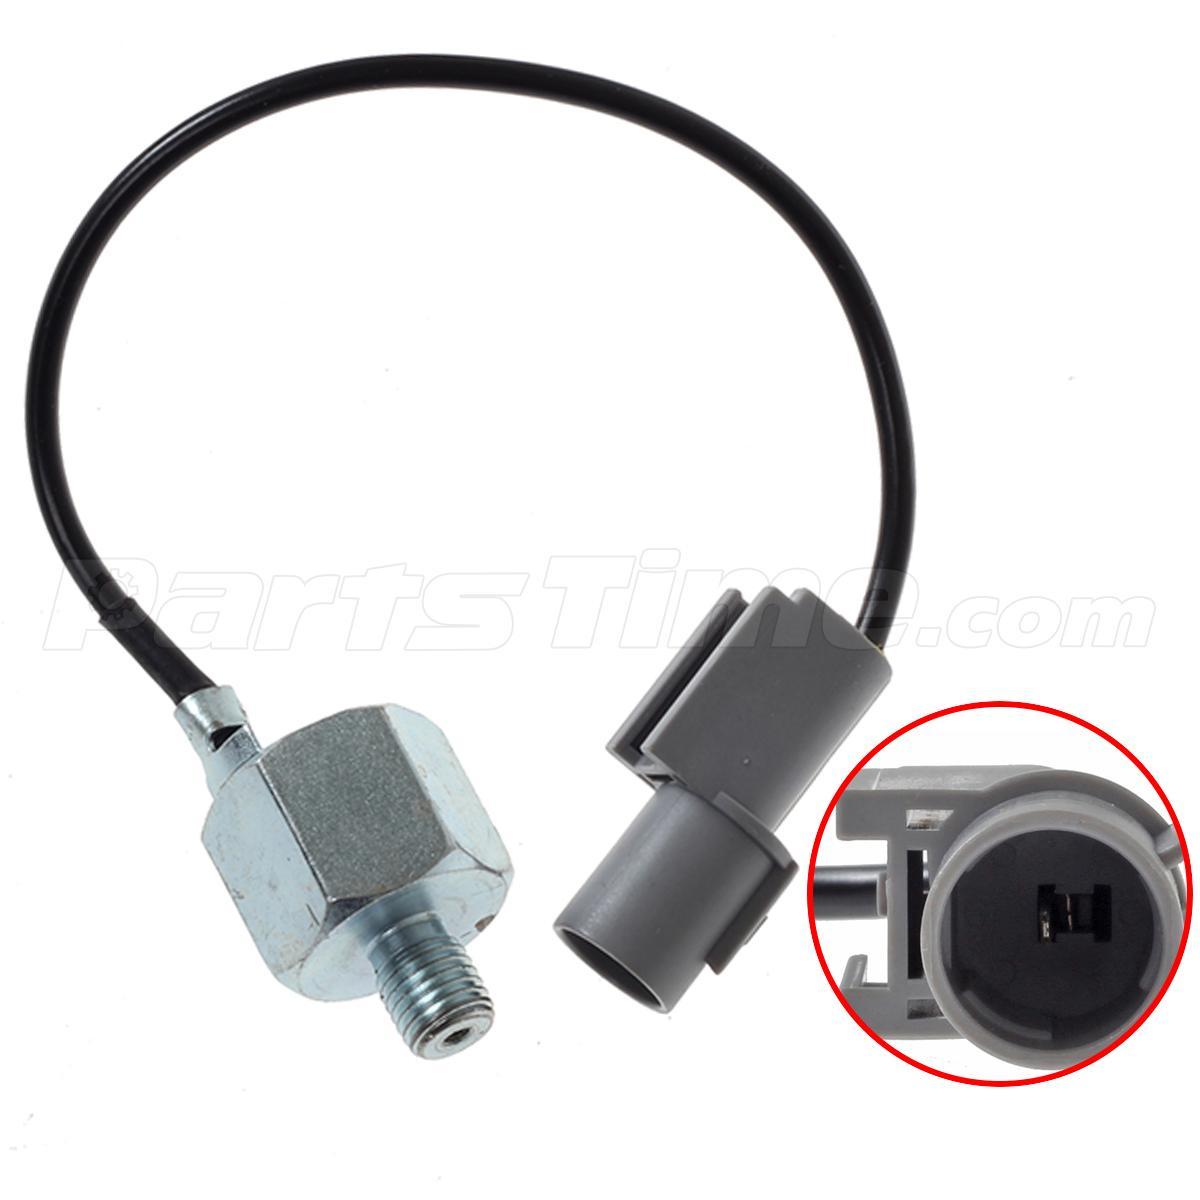 small resolution of engine knock sensor 1864078g00 for suzuki grand vitara ford f 250 fog light wiring harness